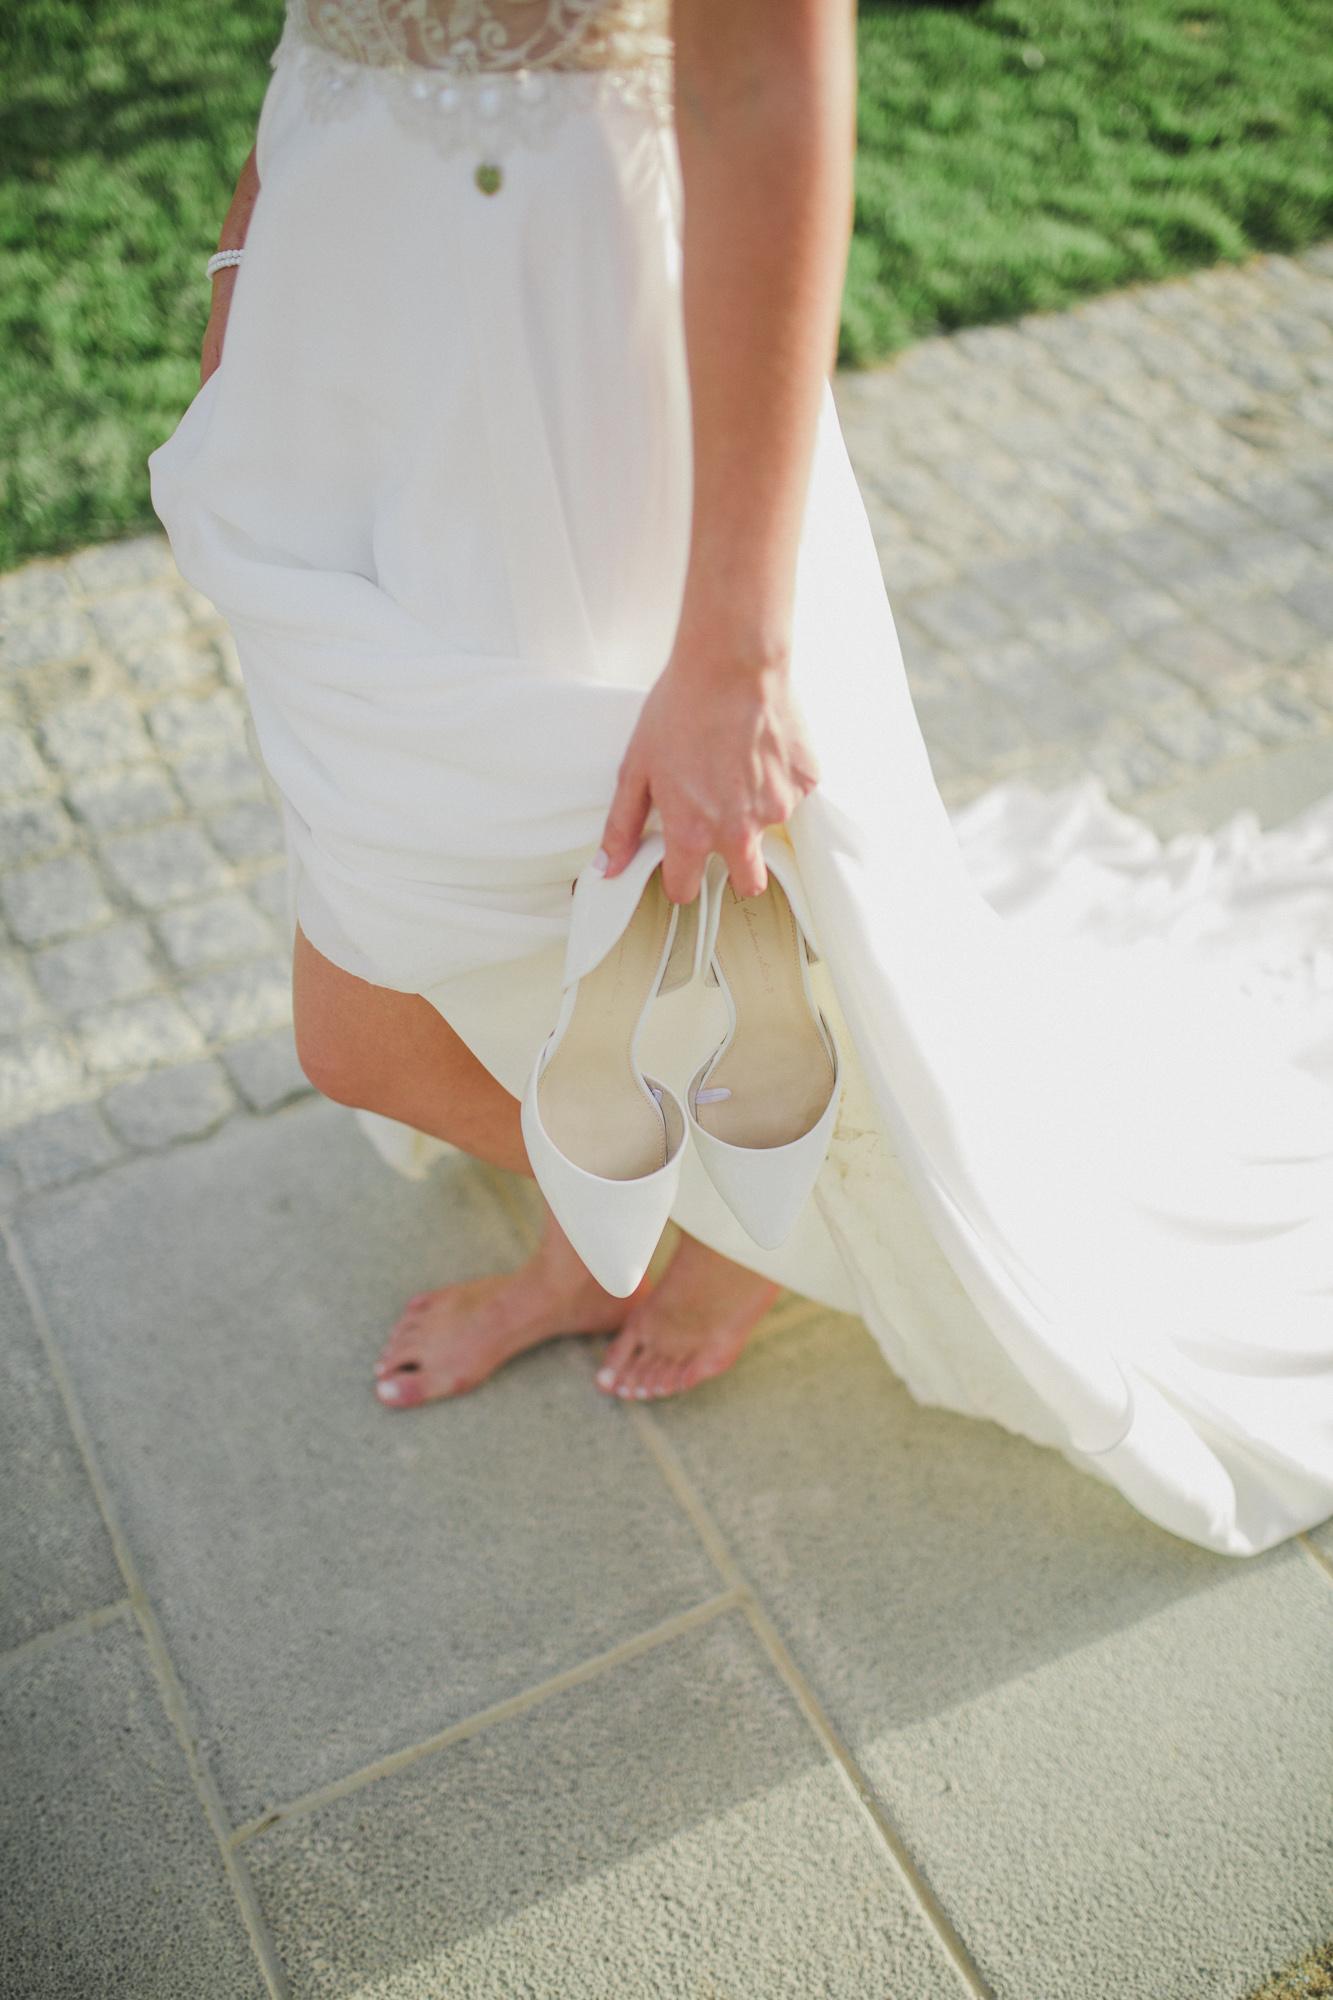 020-carina-e-samuel-wedding-casamento-quinta-dos-rouxinois-rustico-my-fancy-wedding-mafra-malveira-lisboa-sintra-cascais-filipe-santiago-fotografia-fotografo-lifestyle-destination-portugal